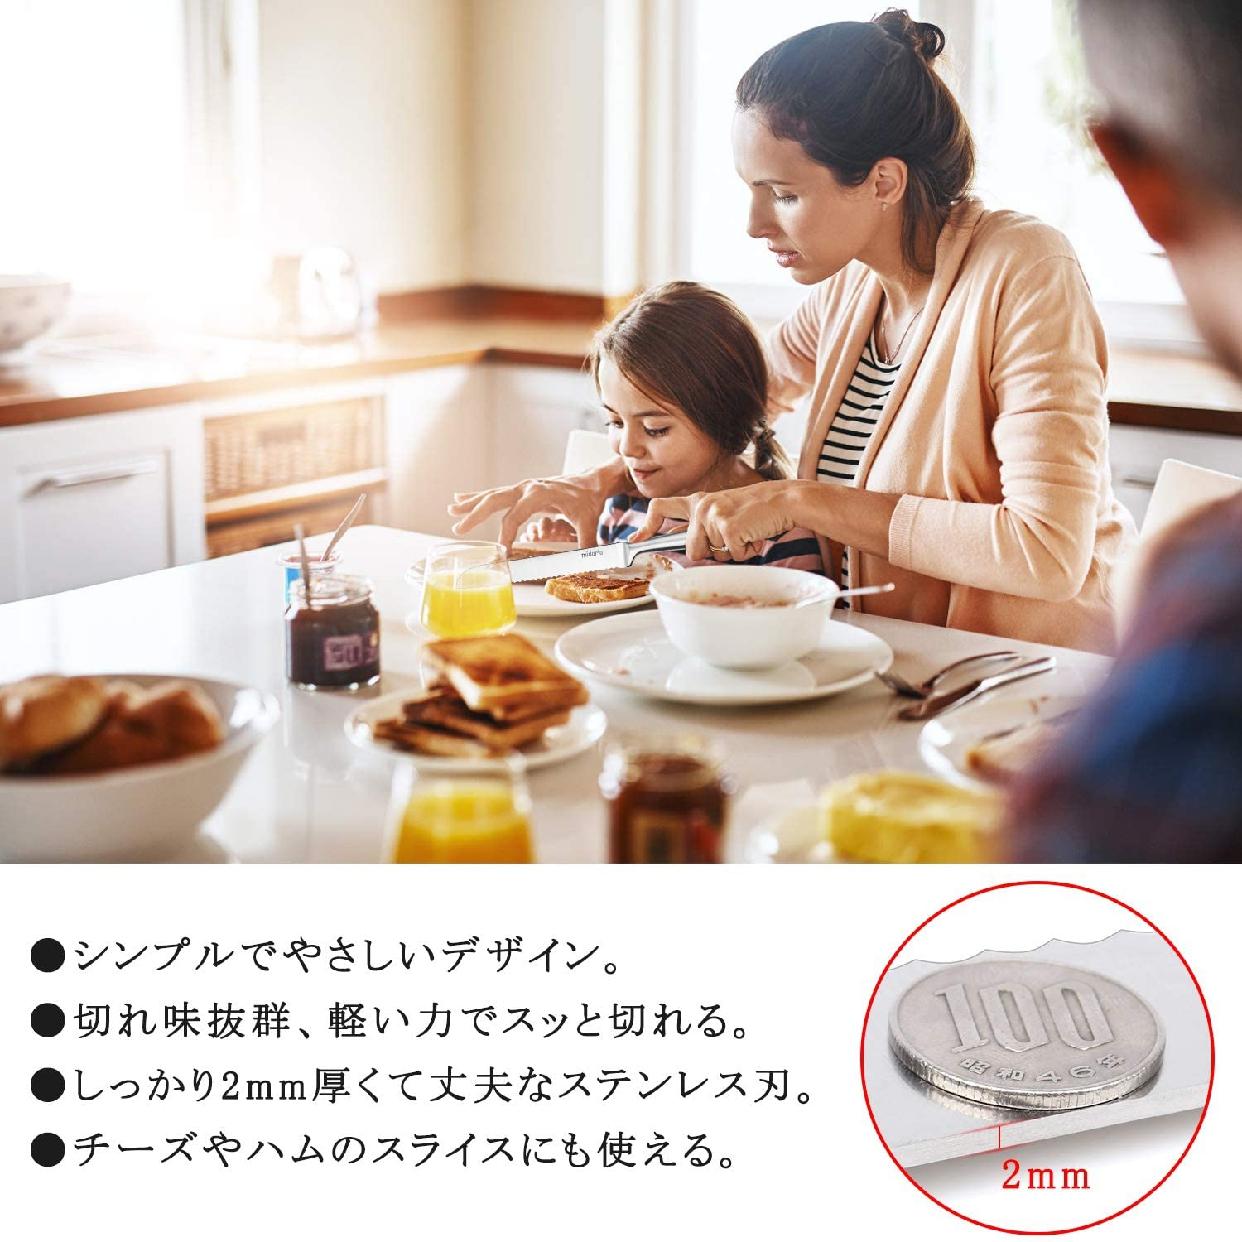 MIDORIA(ミドリア) パン切りナイフ シルバーの商品画像6